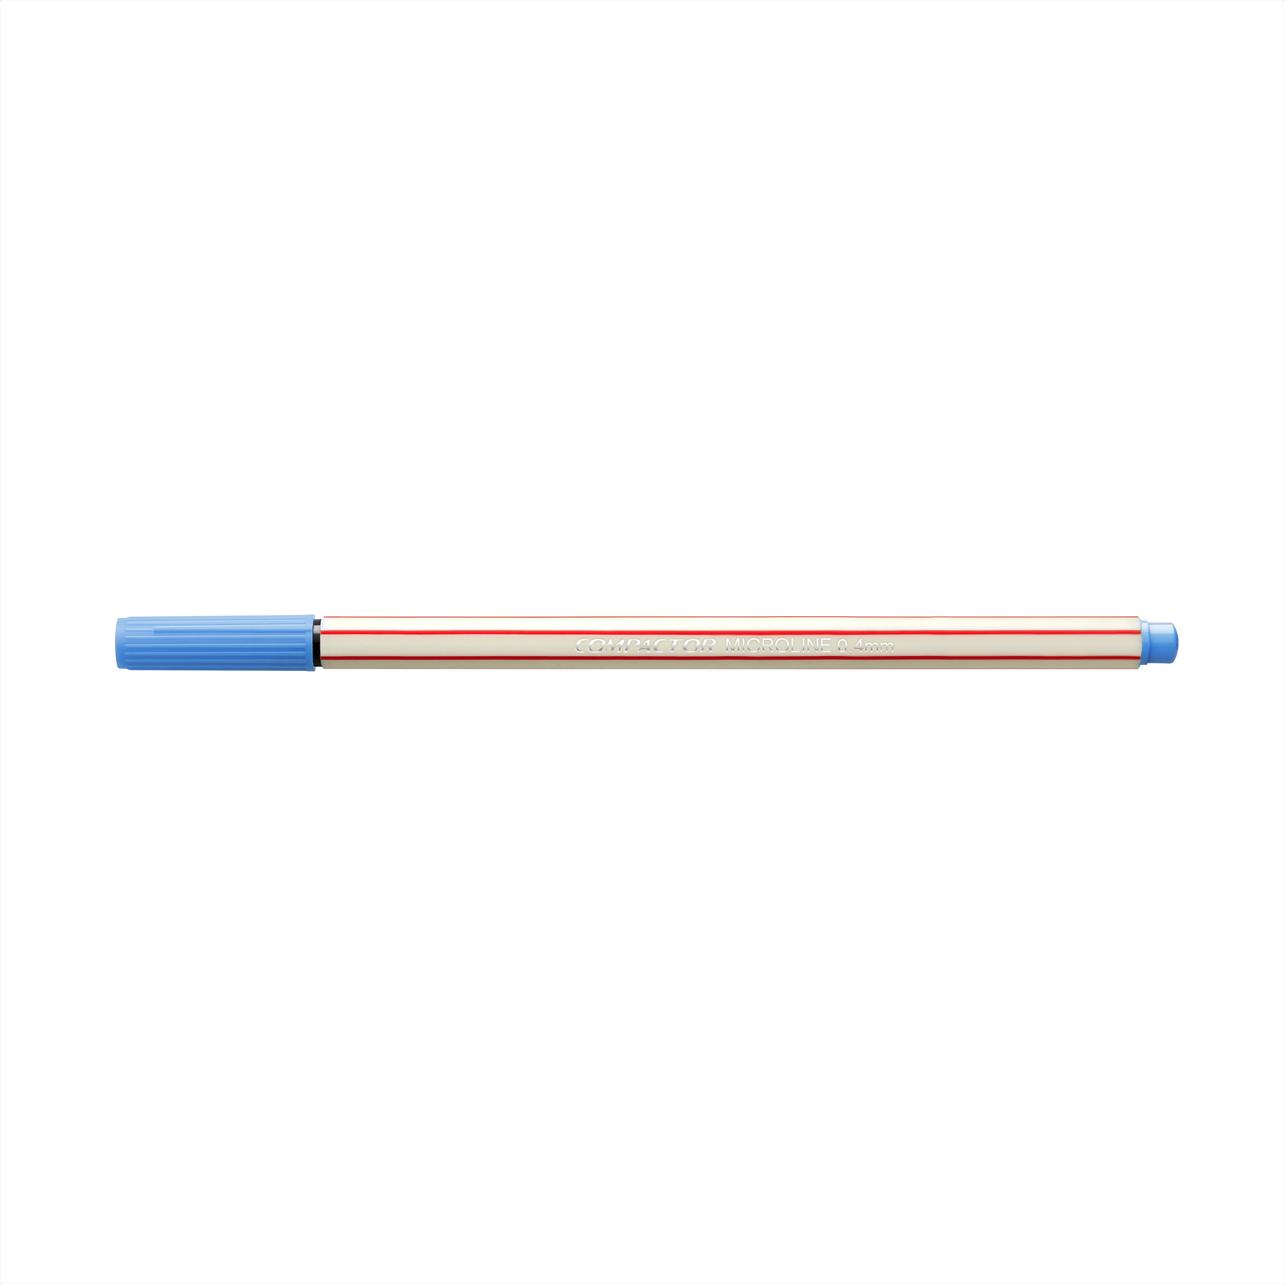 Caneta Hidrográfica 0.4 azul claro MICROLINE Compactor